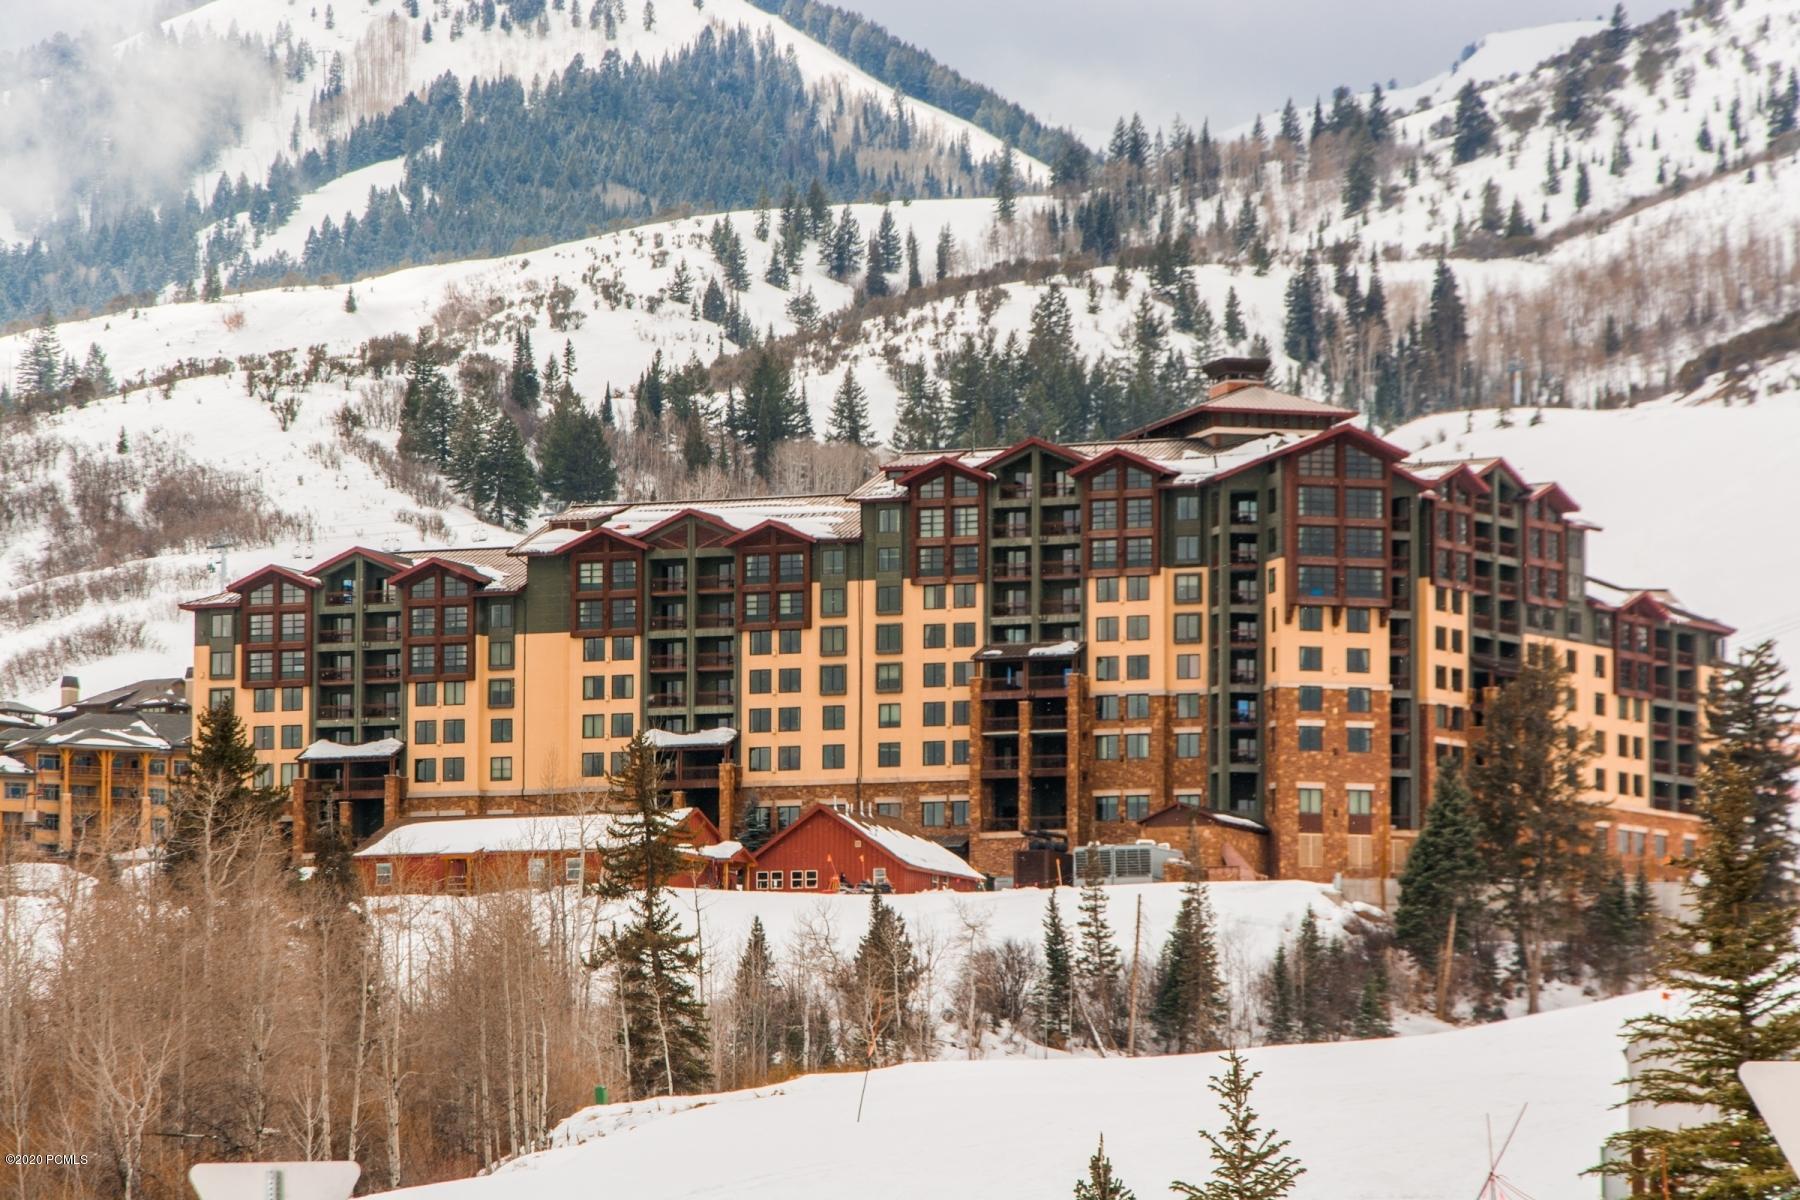 3855 Grand Summit Drive, Park City, Utah 84098, 1 Bedroom Bedrooms, ,2 BathroomsBathrooms,Condominium,For Sale,Grand Summit,12003020